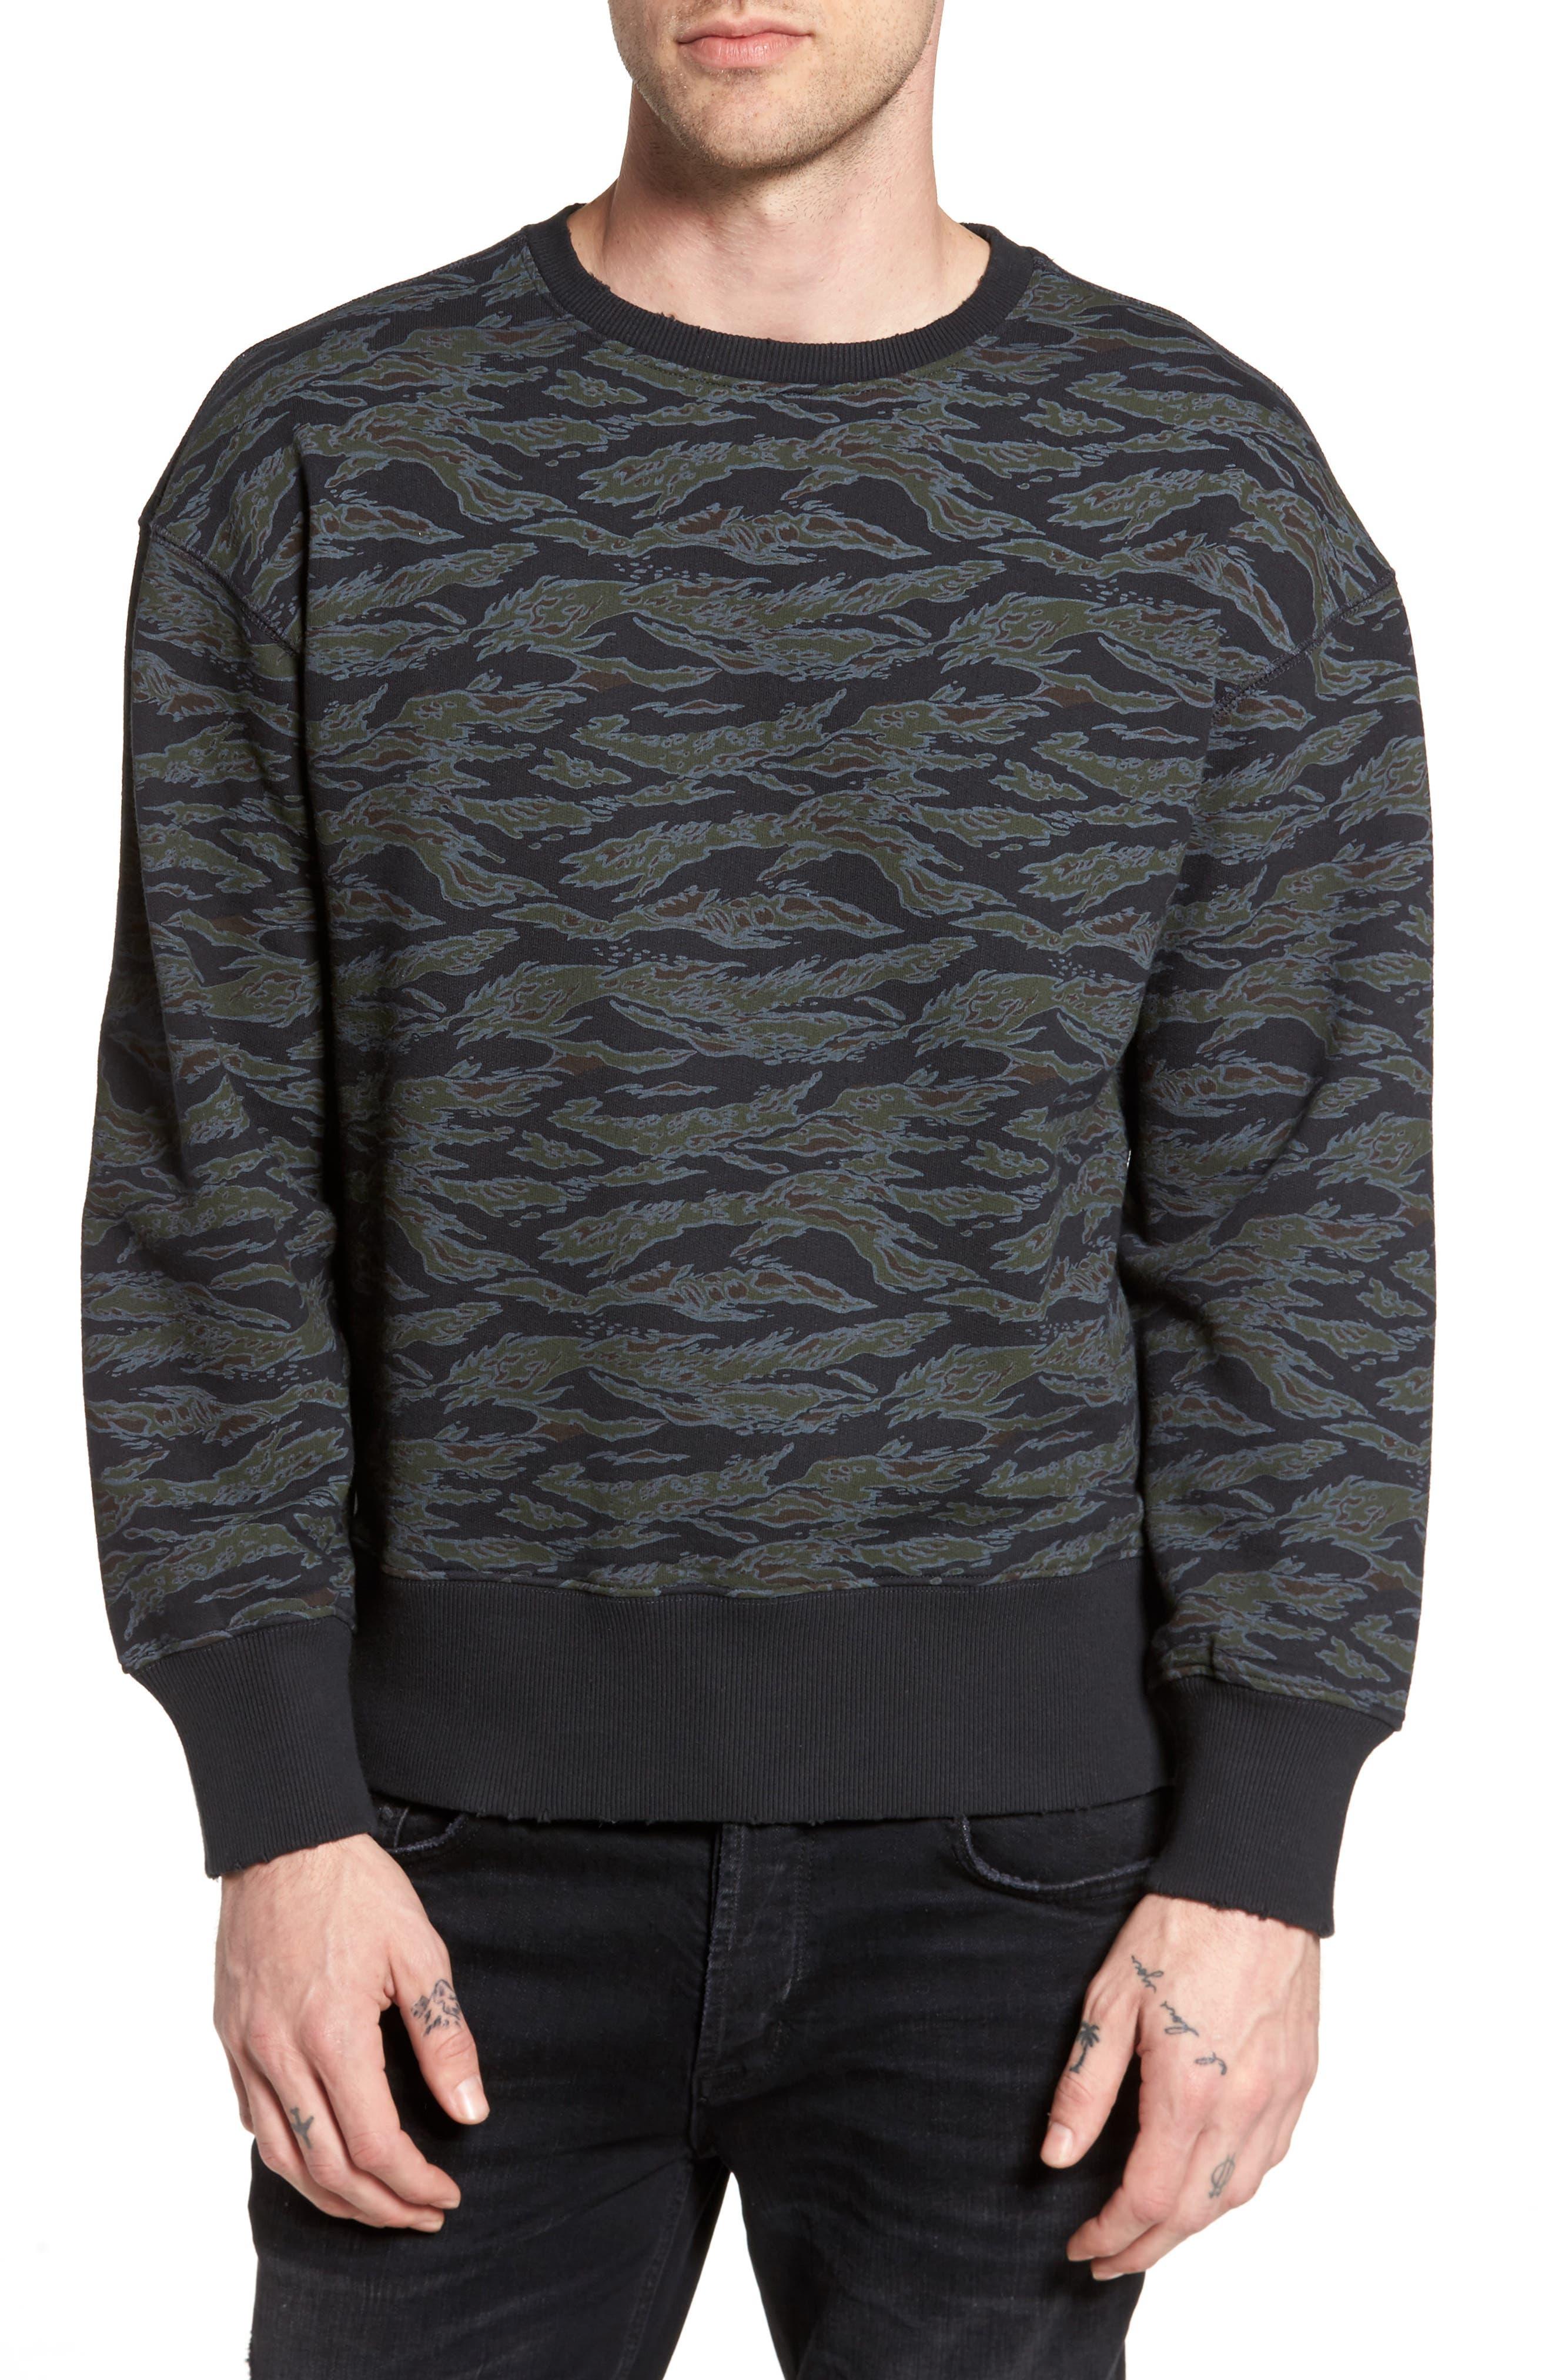 The Rail Print Sweatshirt